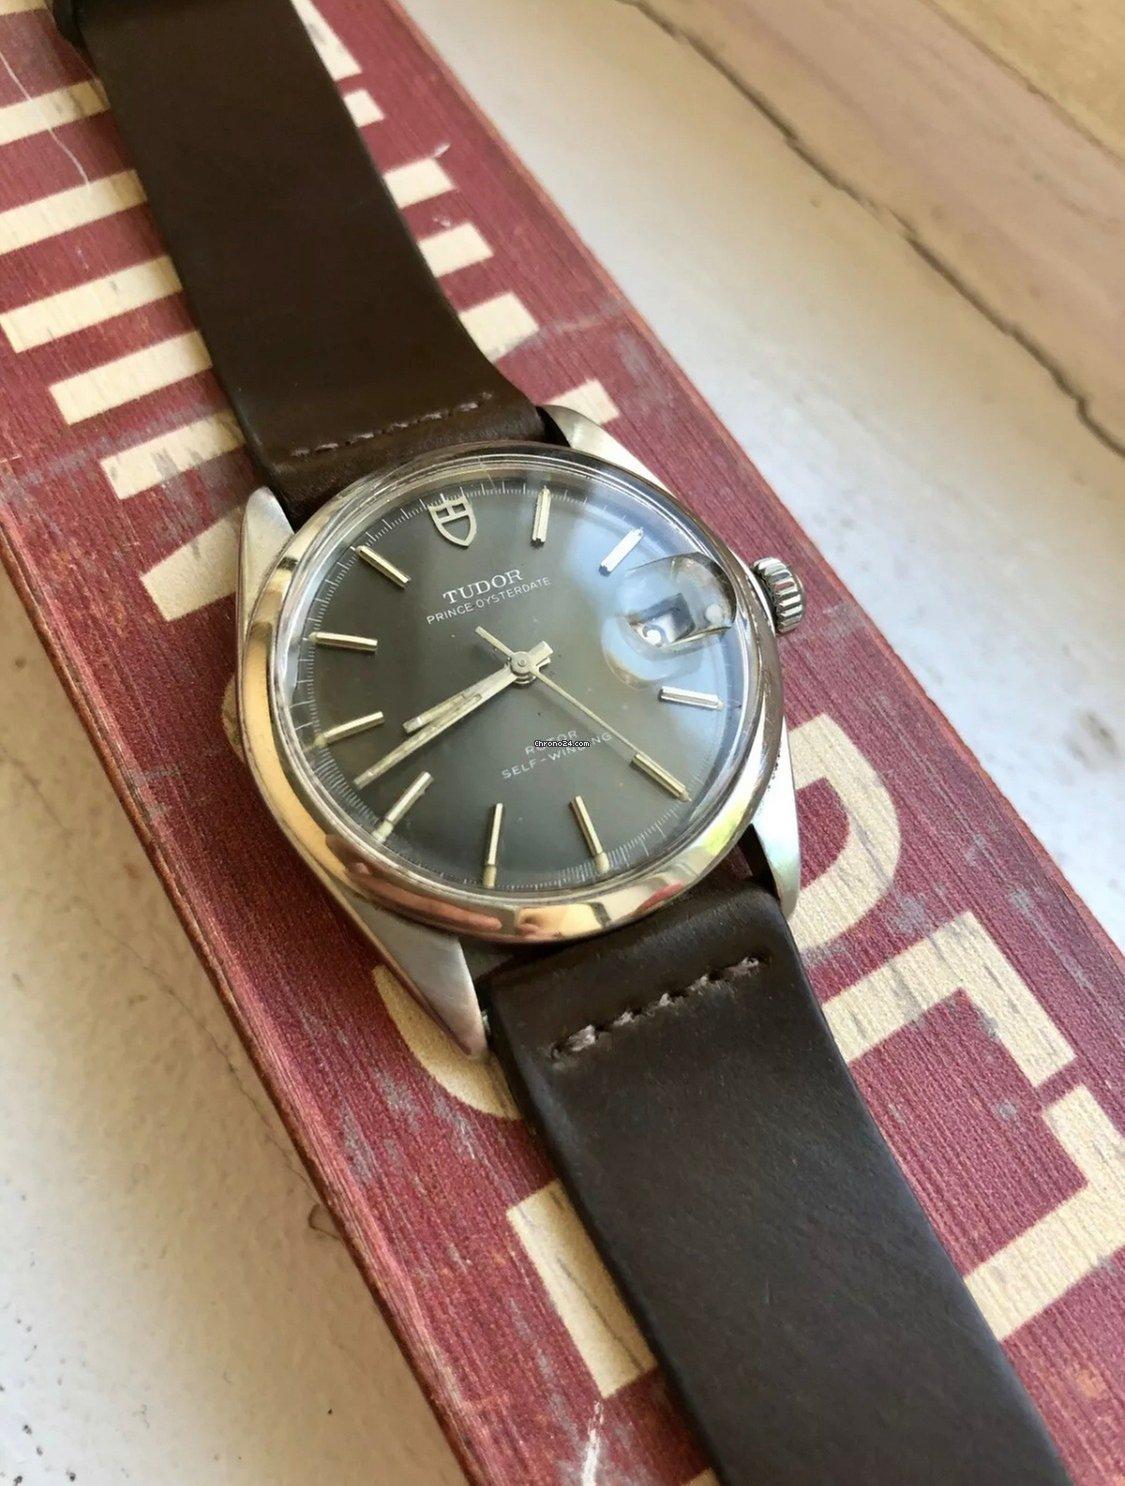 Vintage Tudor Watches >> Tudor Vintage Tudor Grey Dial Automatic Manual Wind Oysterdate